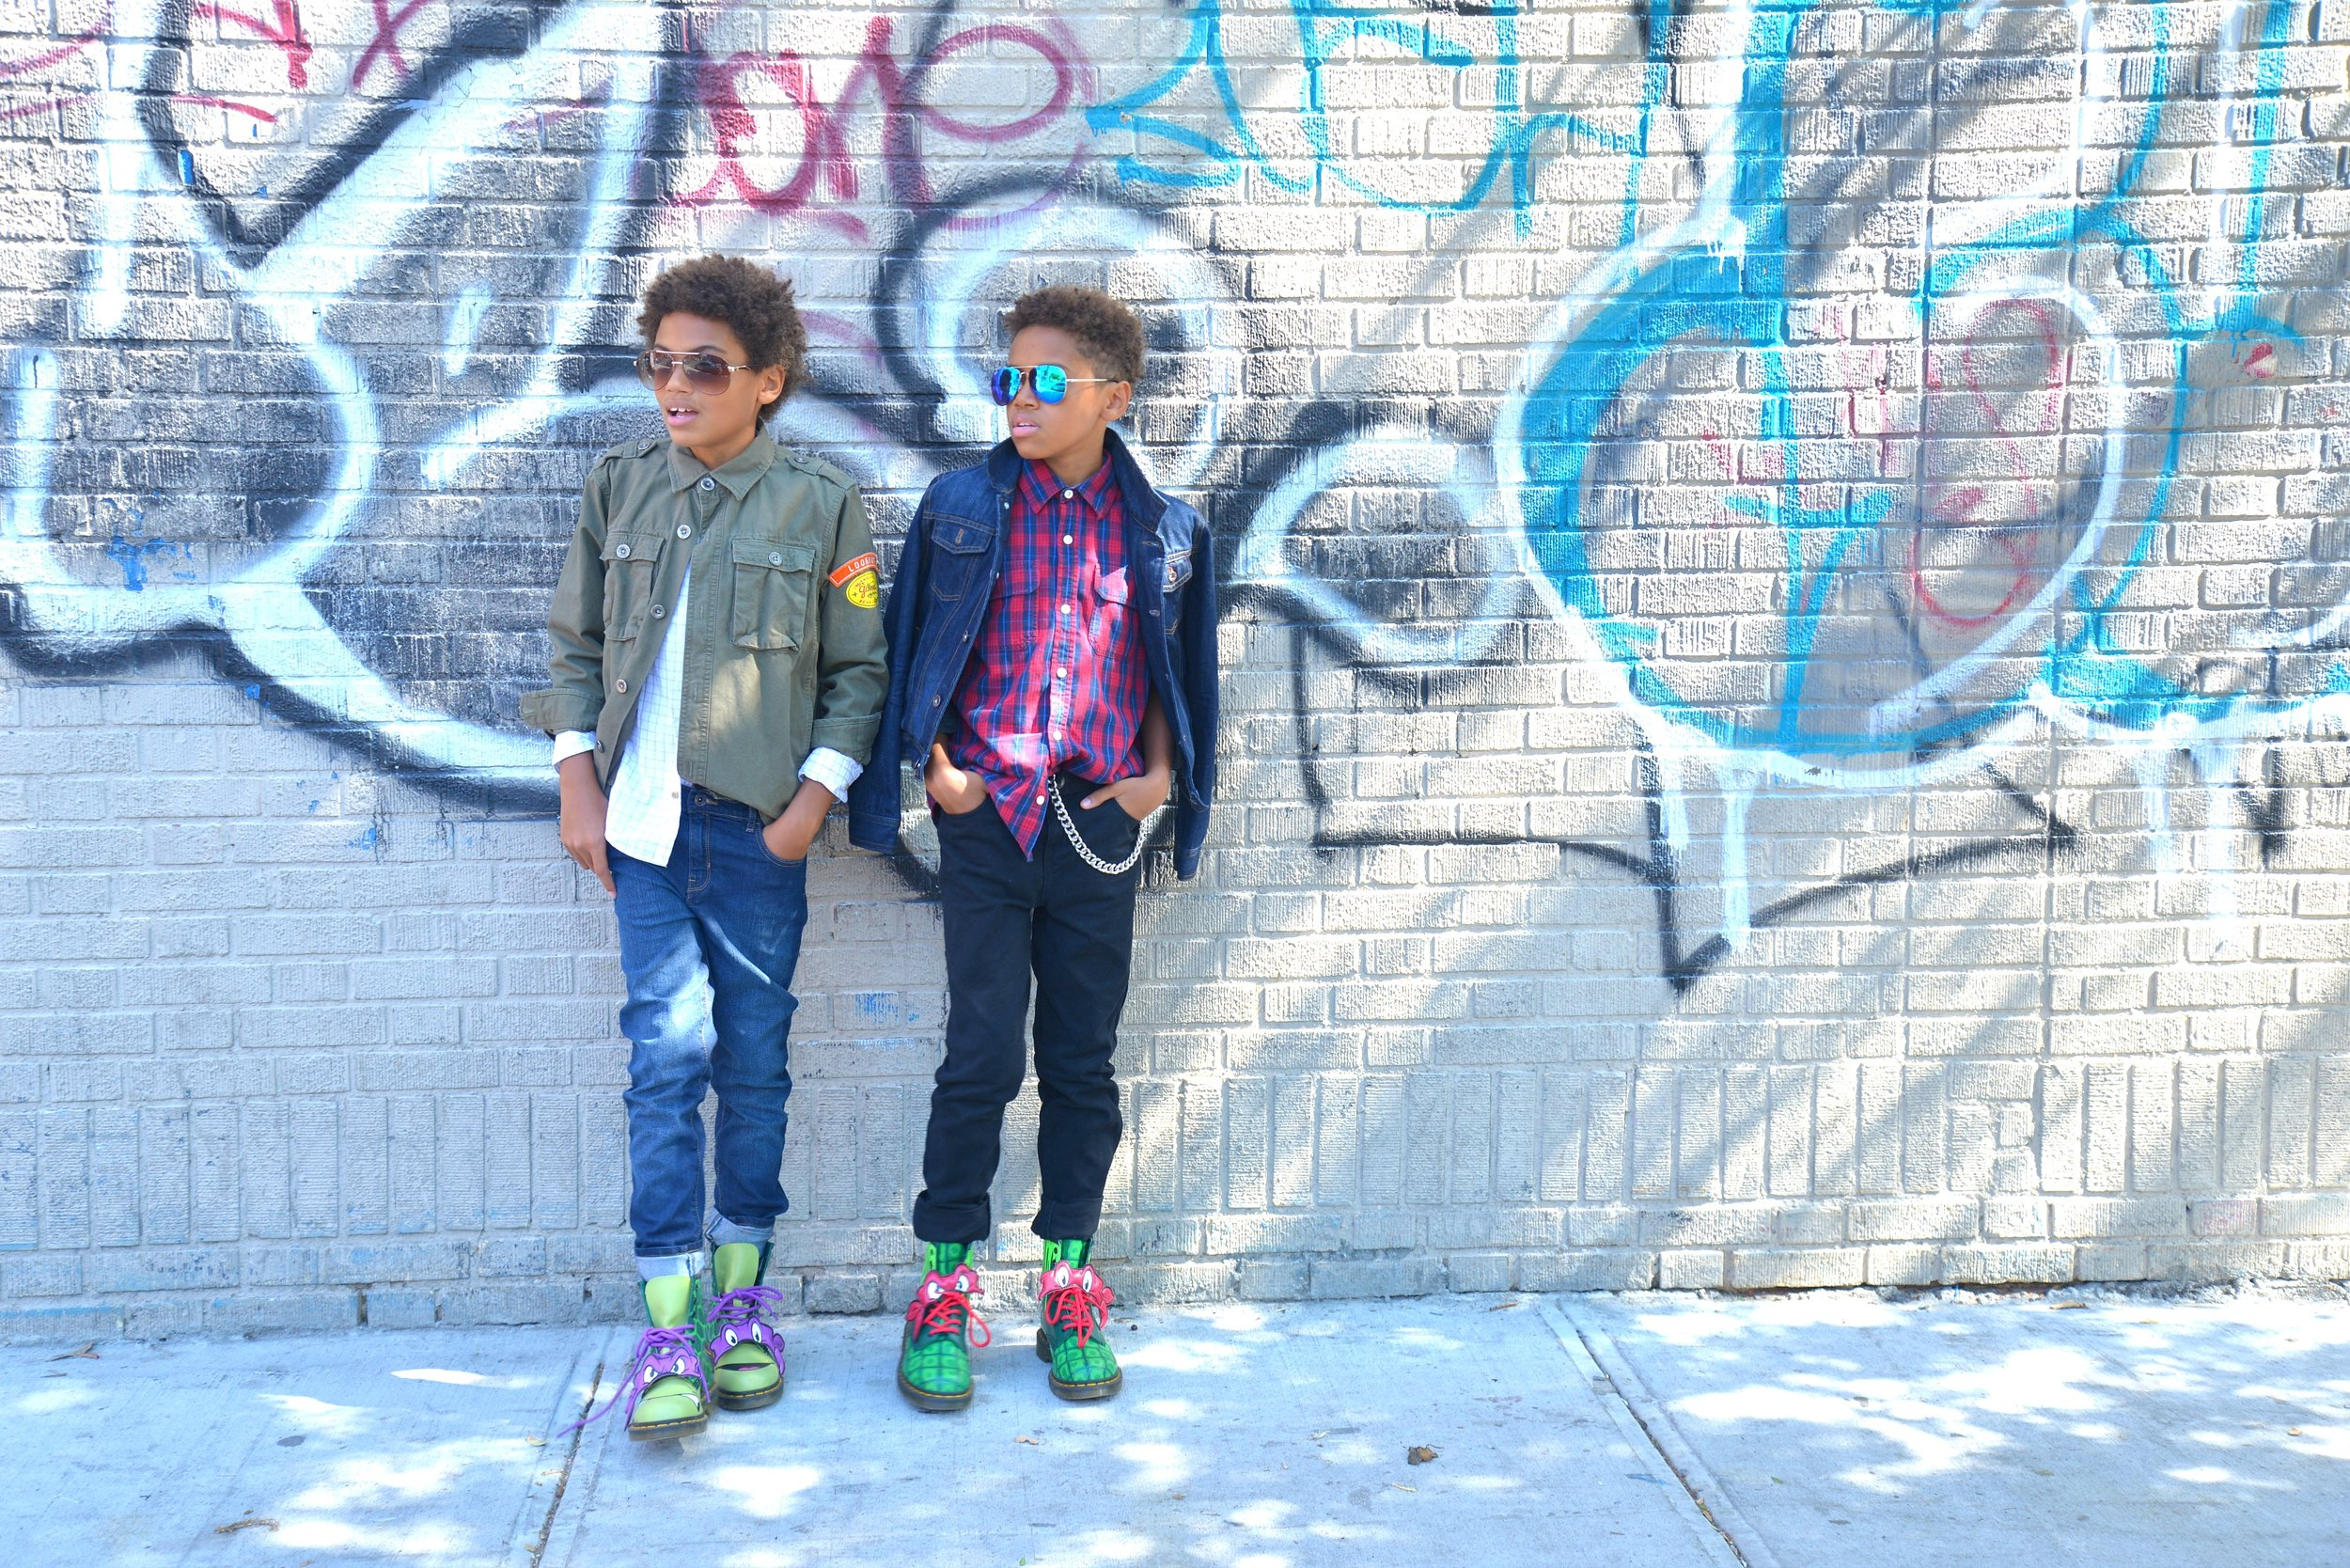 TRISTIN  Gap Jacket/Zara Shirt/Children's Place Jeans   TYLER  Gap Shirt/Gap Jacket/Children's Place Jeans